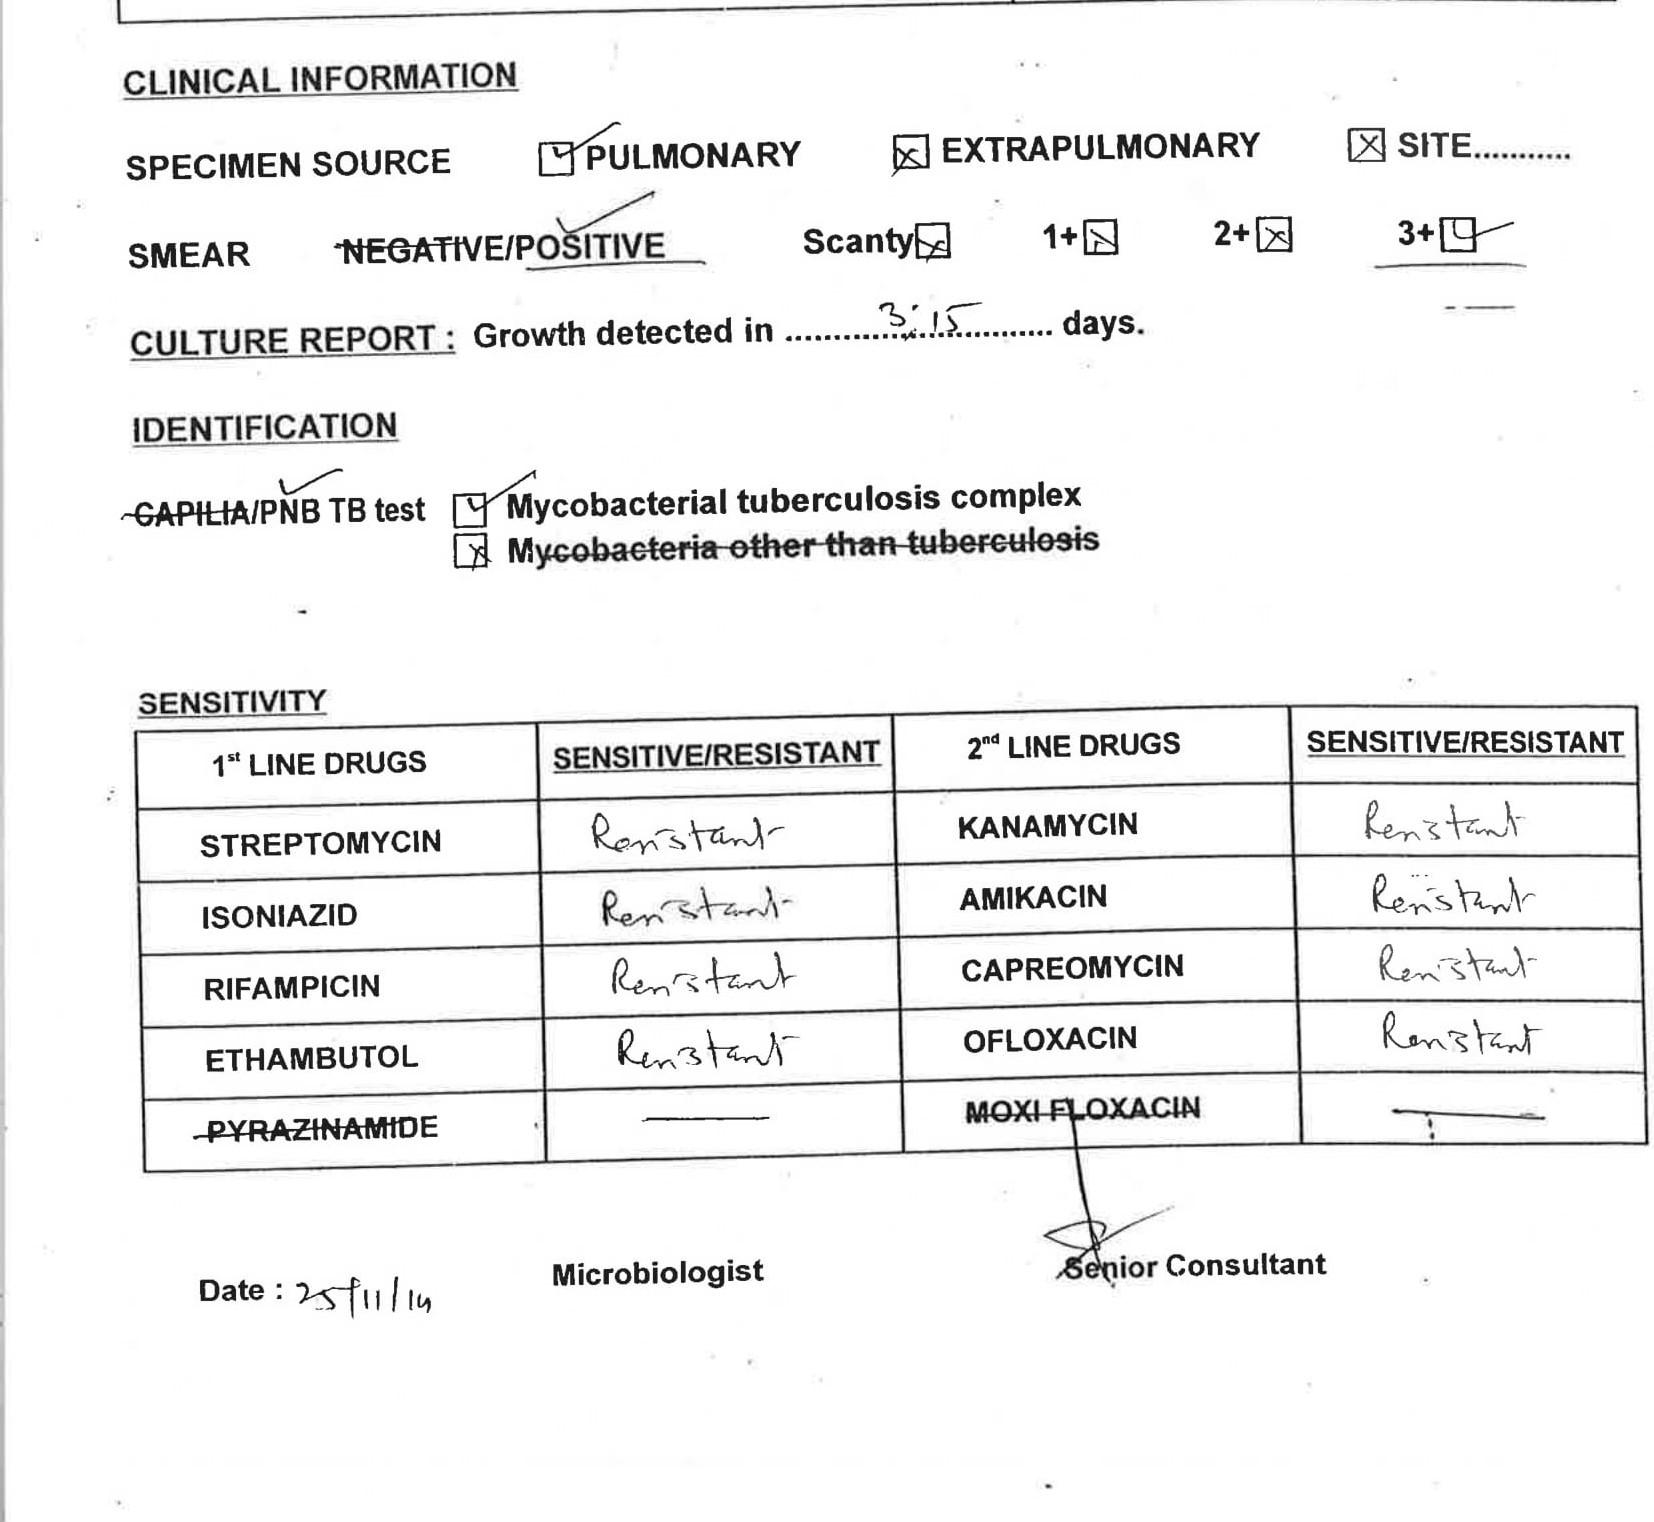 Priya's drug sensitivity test report from November 2014.